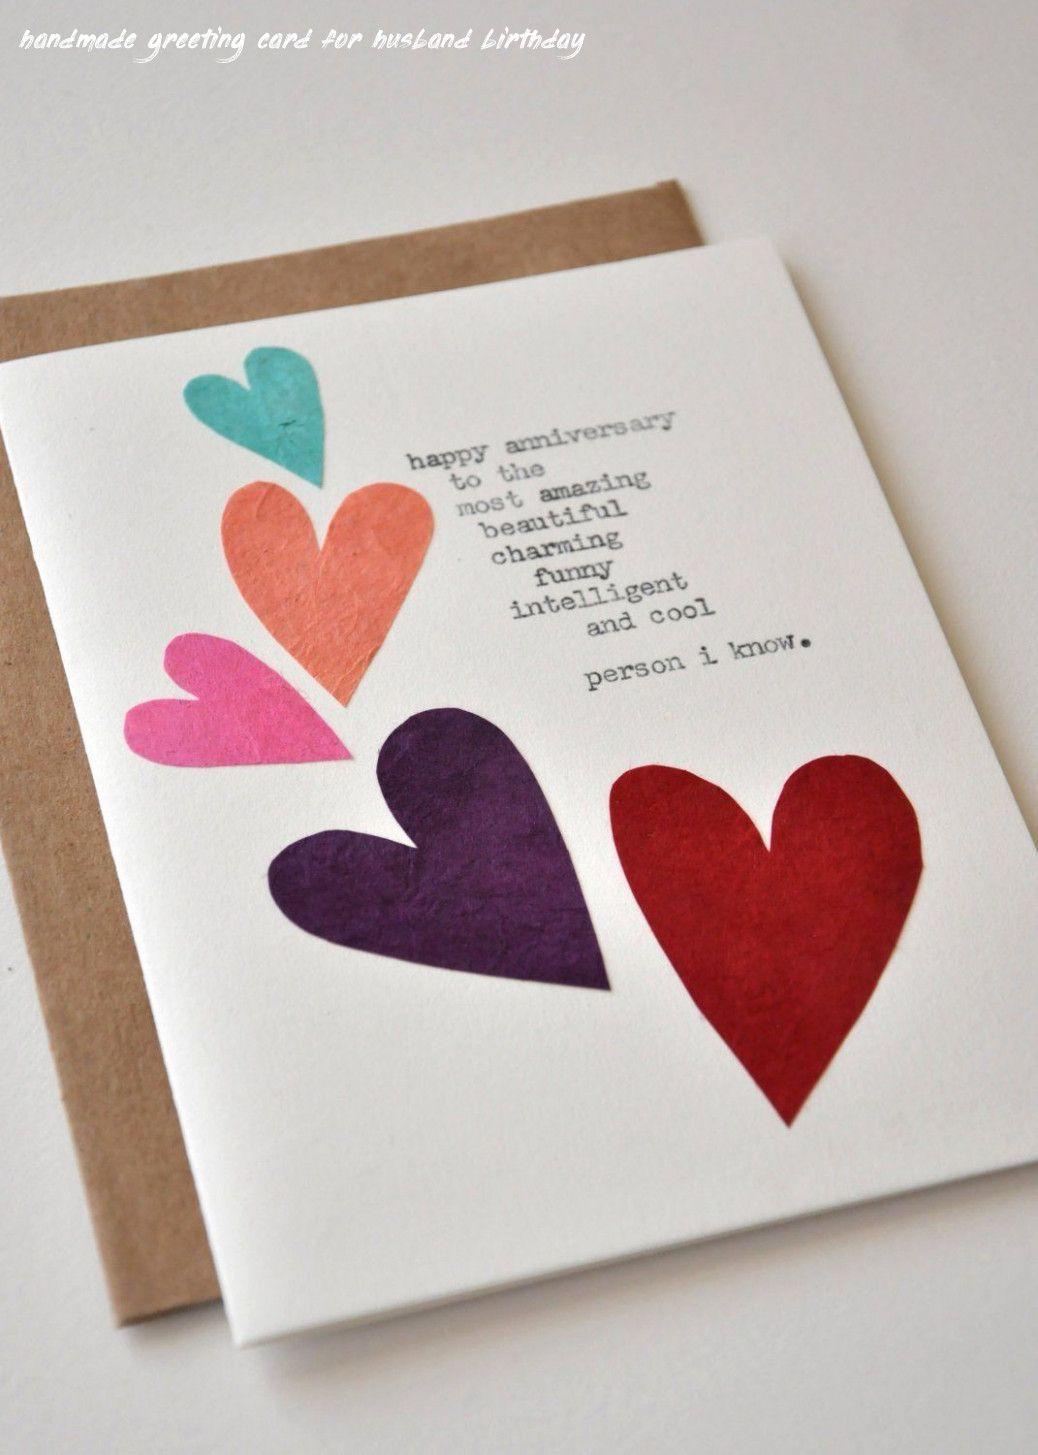 6 Handmade Greeting Card For Husband Birthday Husband Birthday Card Creative Birthday Cards Card Making Birthday